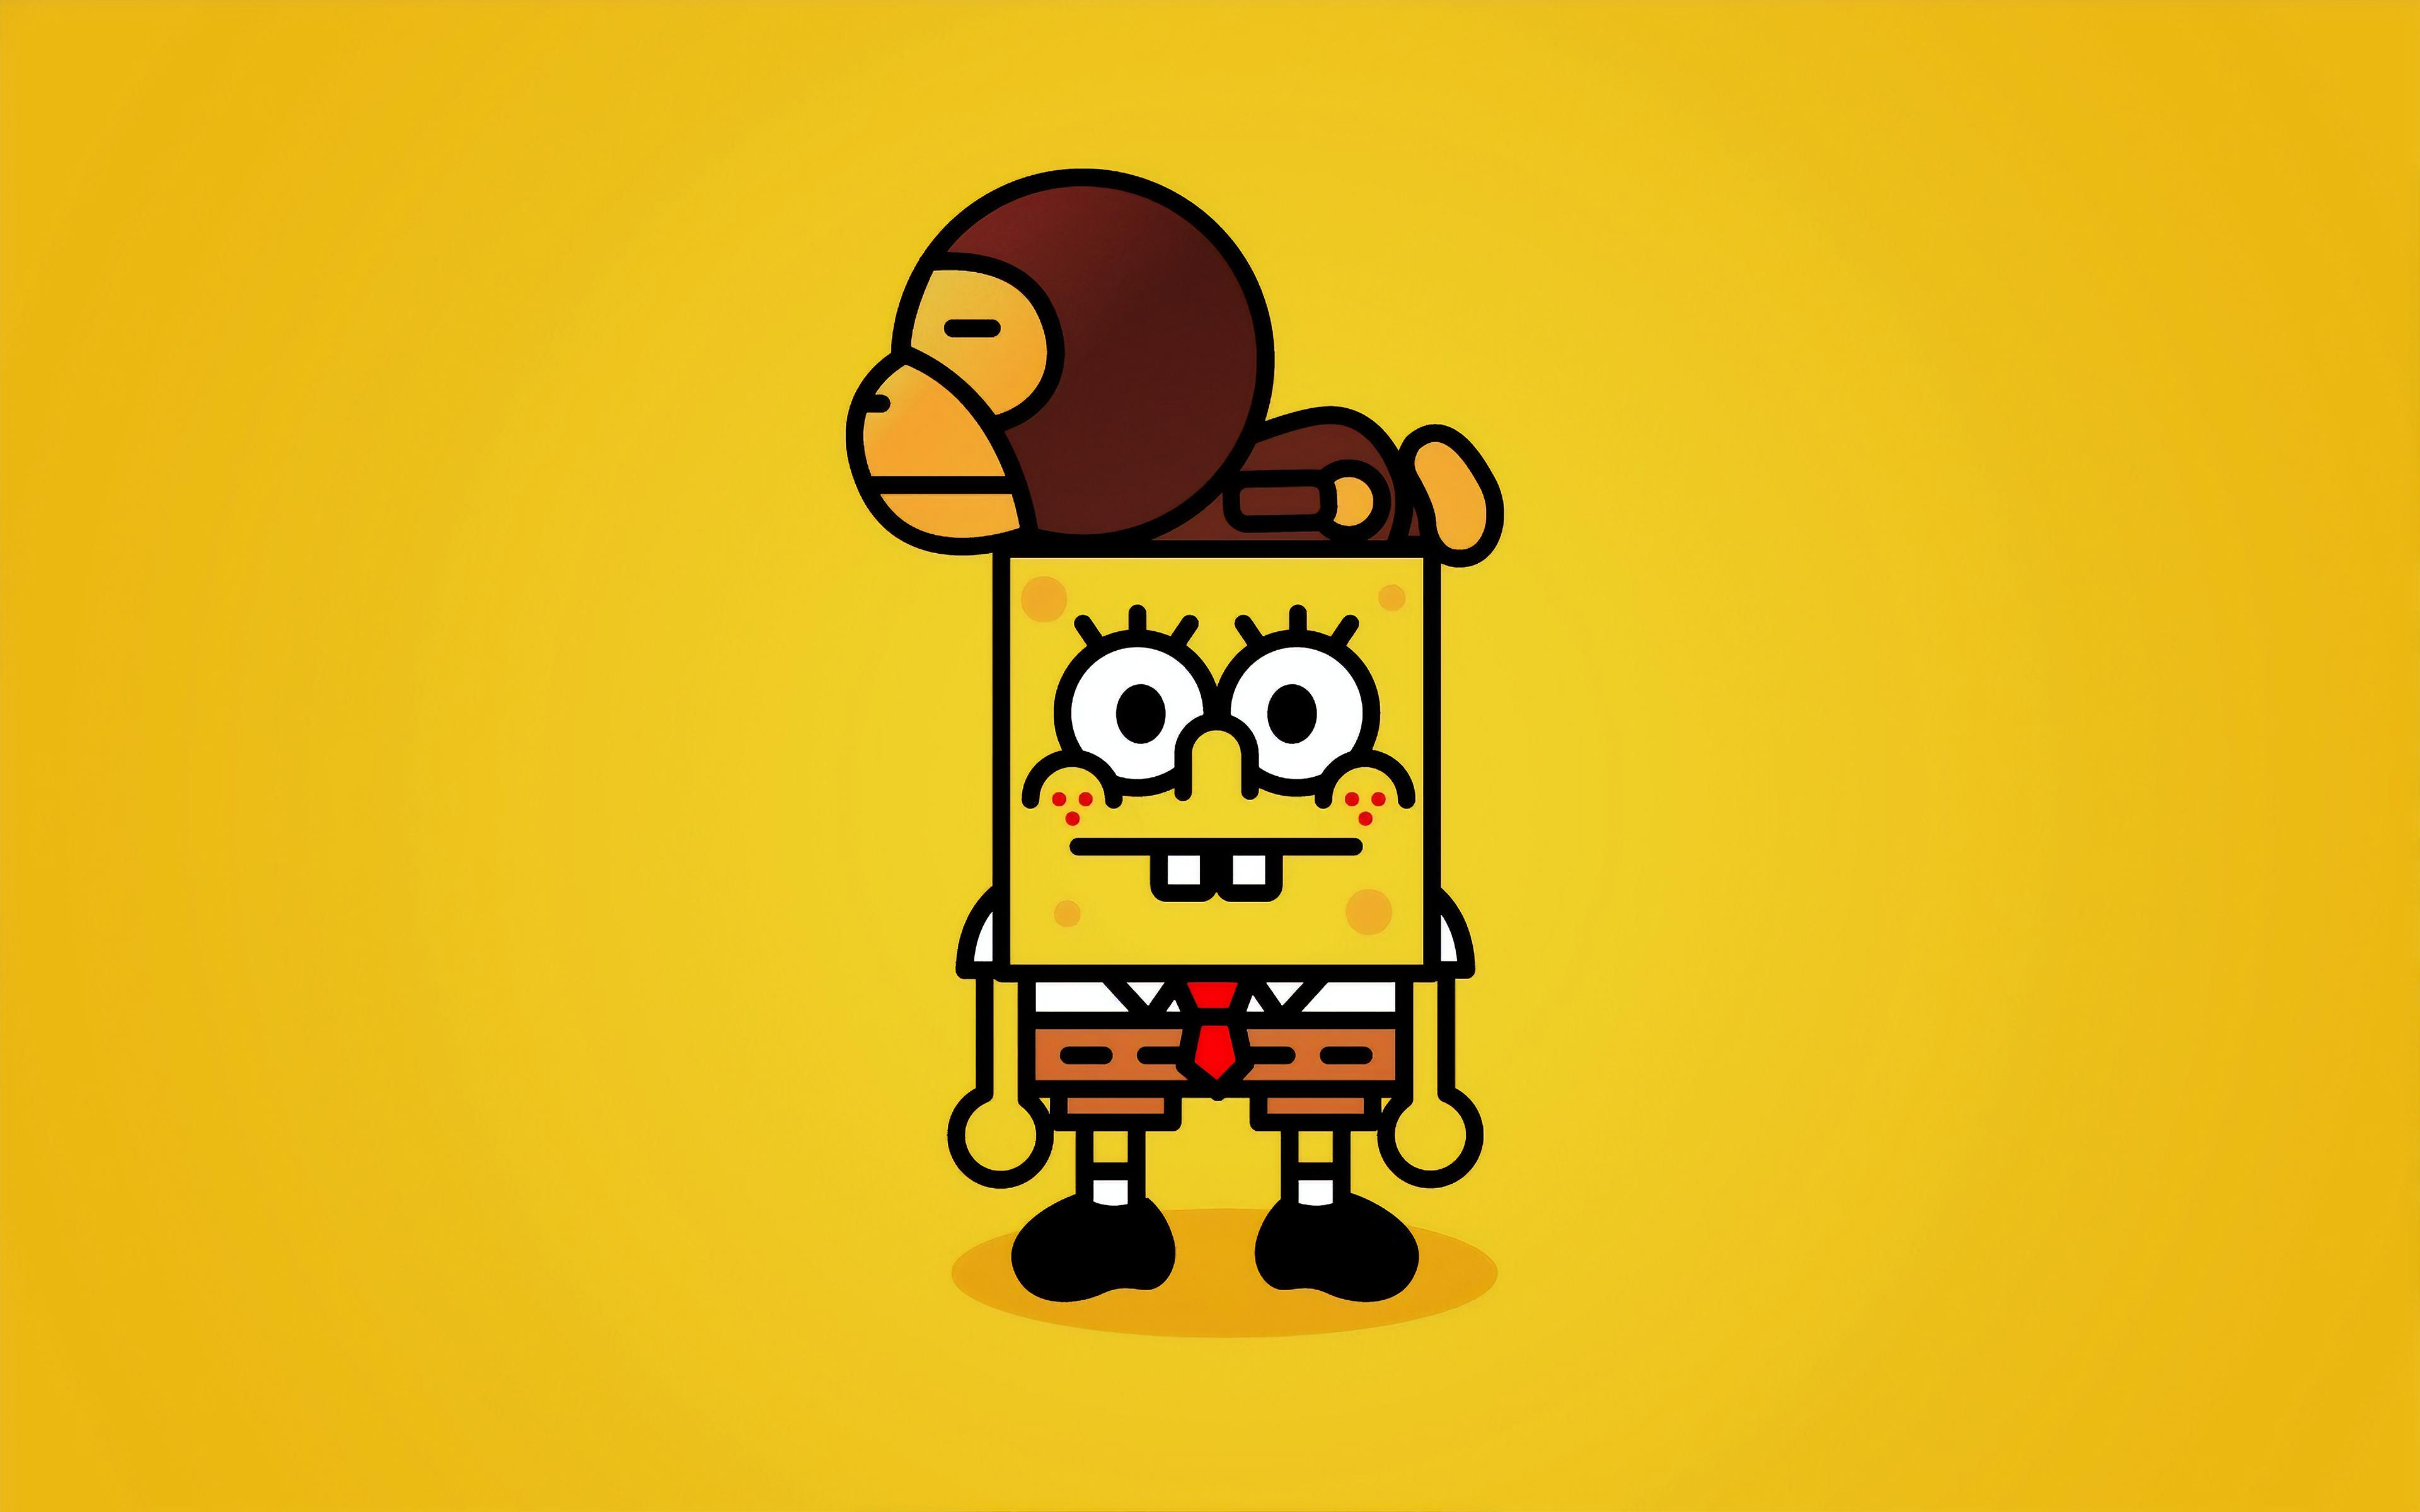 spongebob squarepants 4k 4c